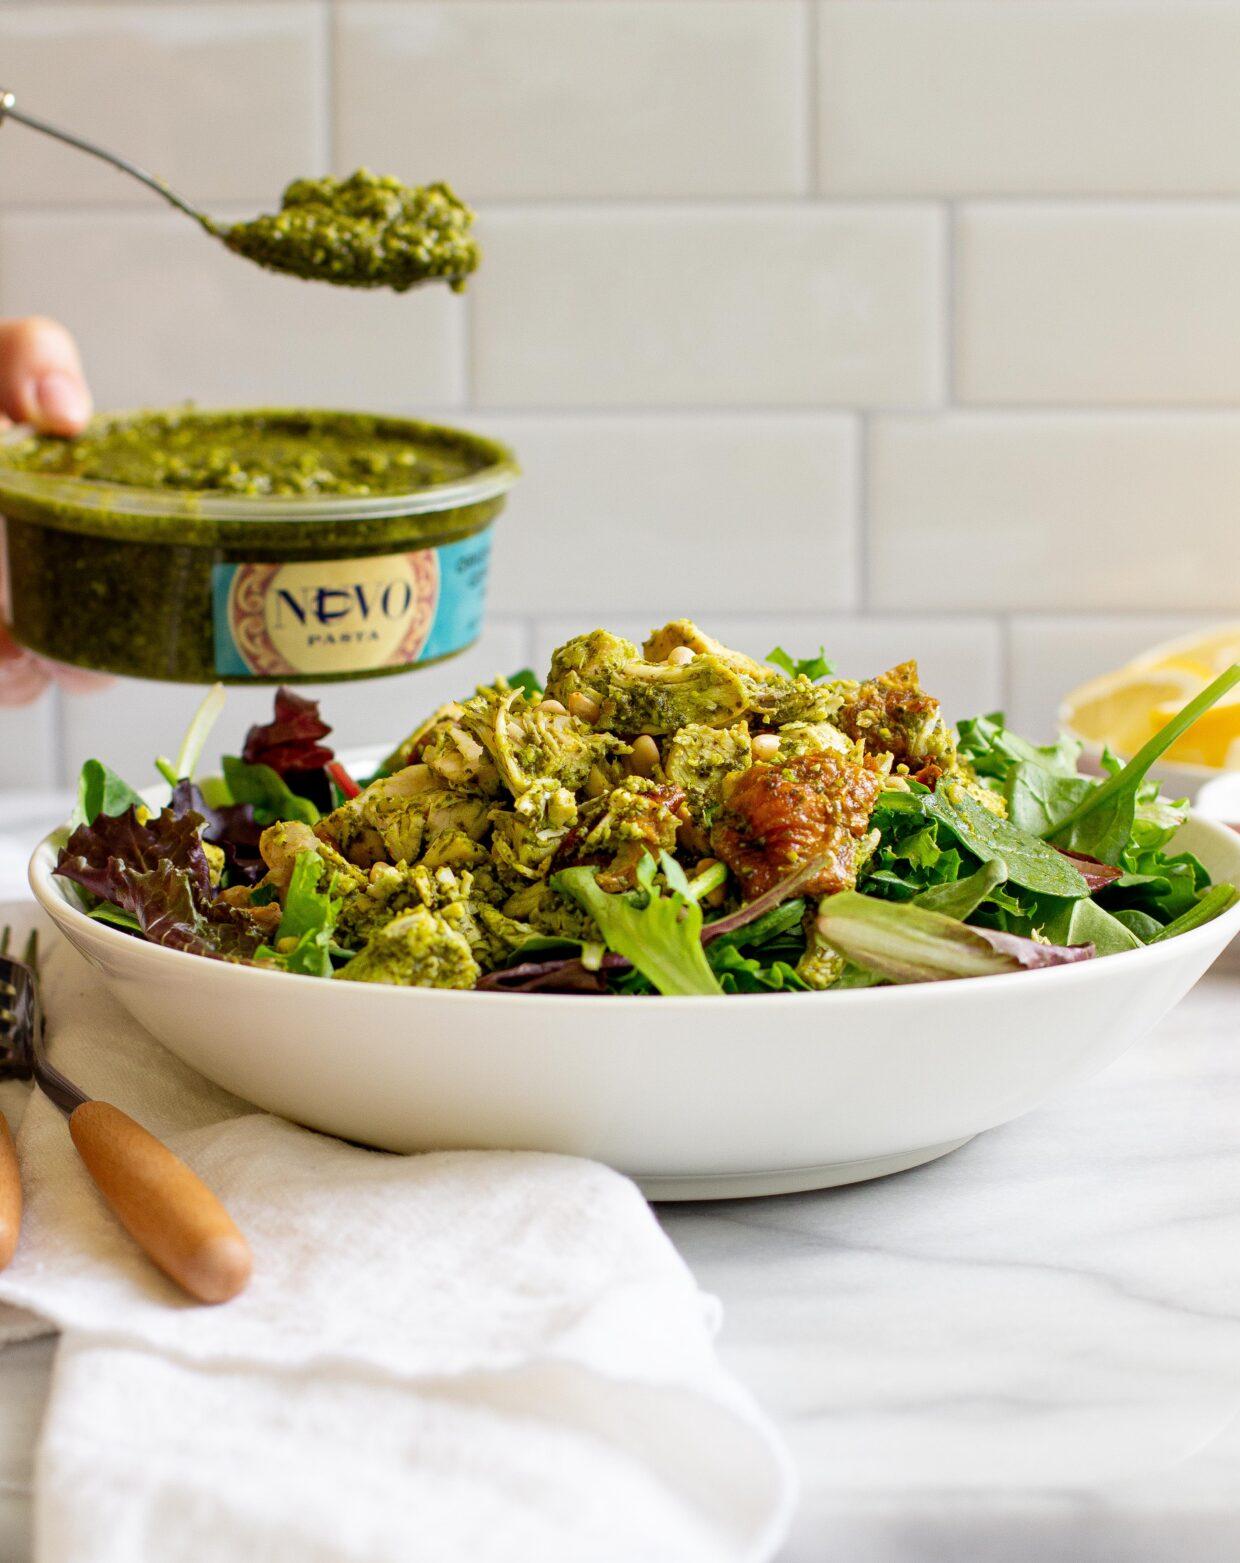 Salad Greens with Chicken Pesto